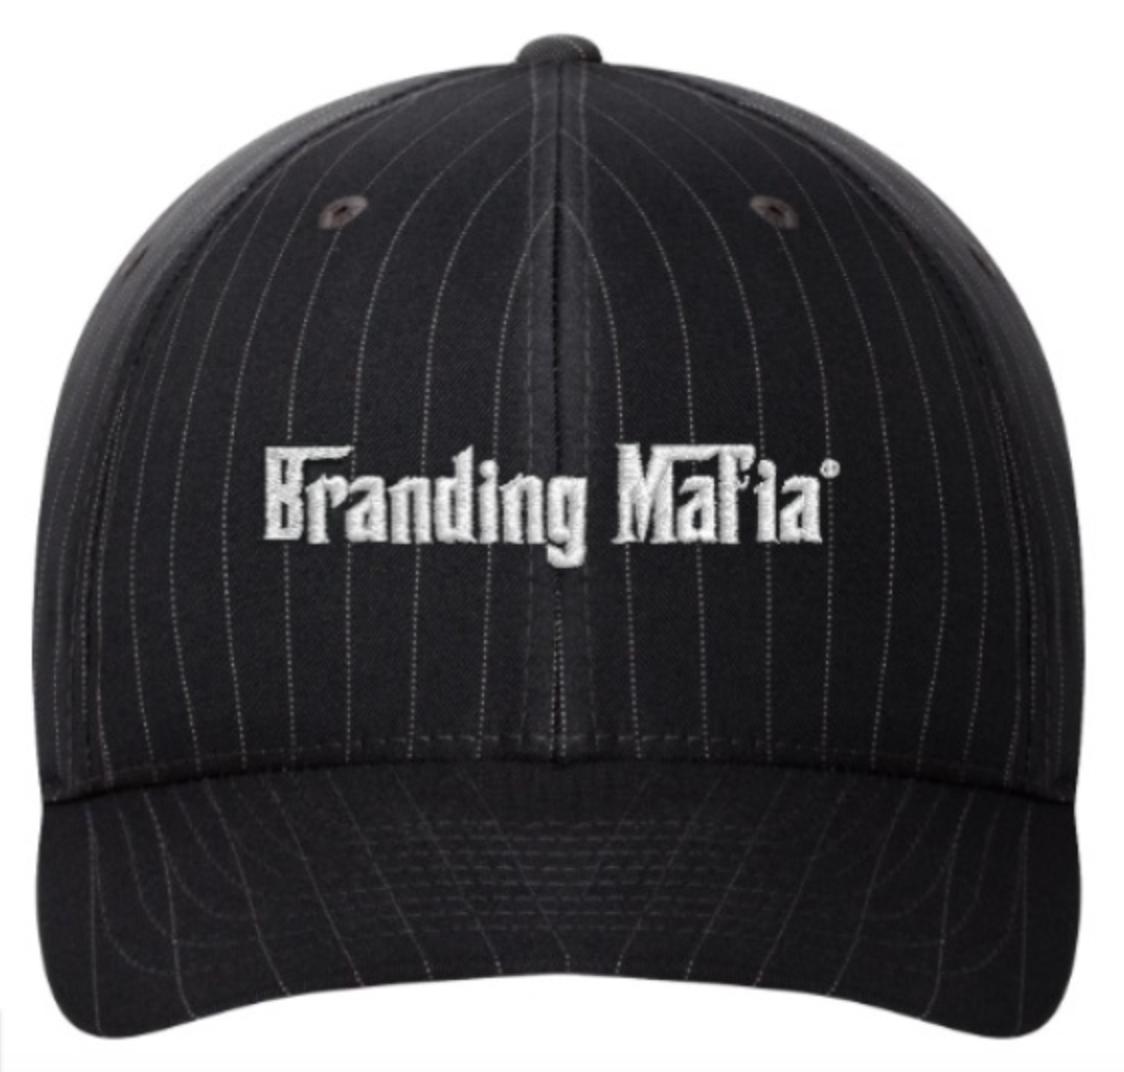 Branding Mafia Pinstripe Fitted Hat PSHBL001